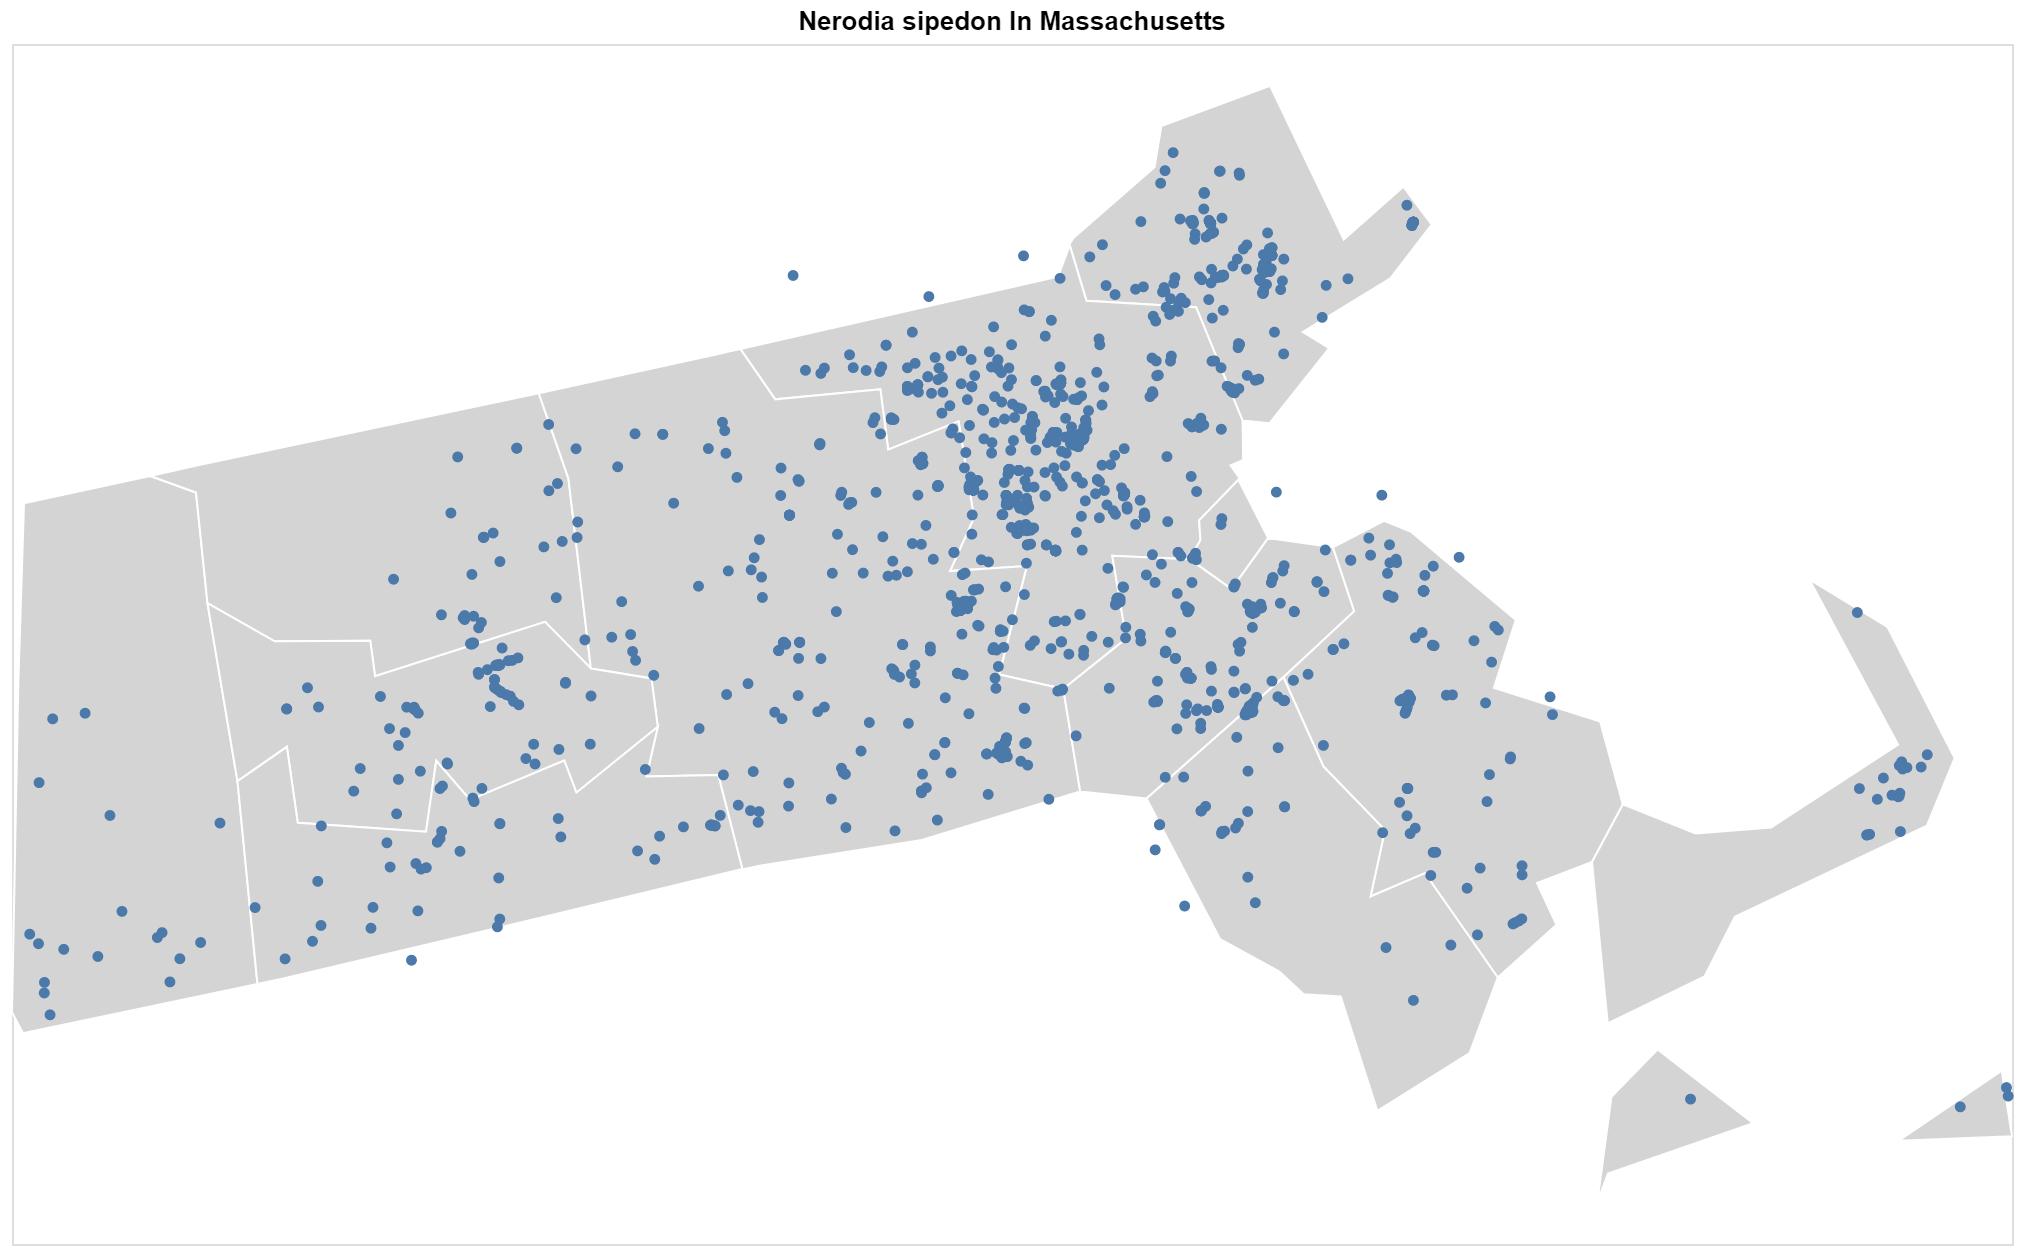 Nerodia sipedon Massachusetts map